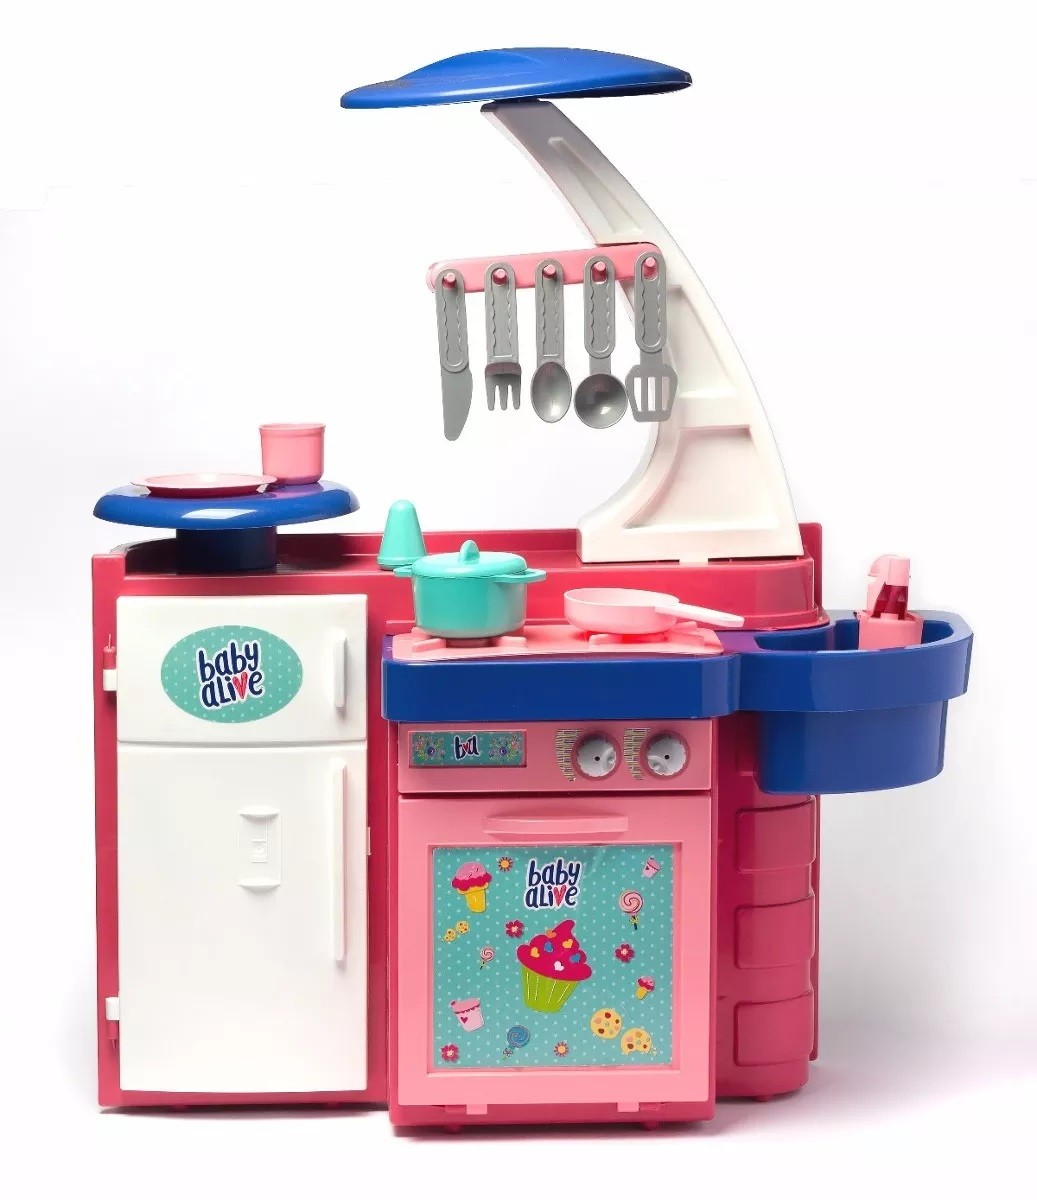 Cozinha Infantil Baby Alive Cheff Gourmet Ref 2143 Cotipl S Rpn Store